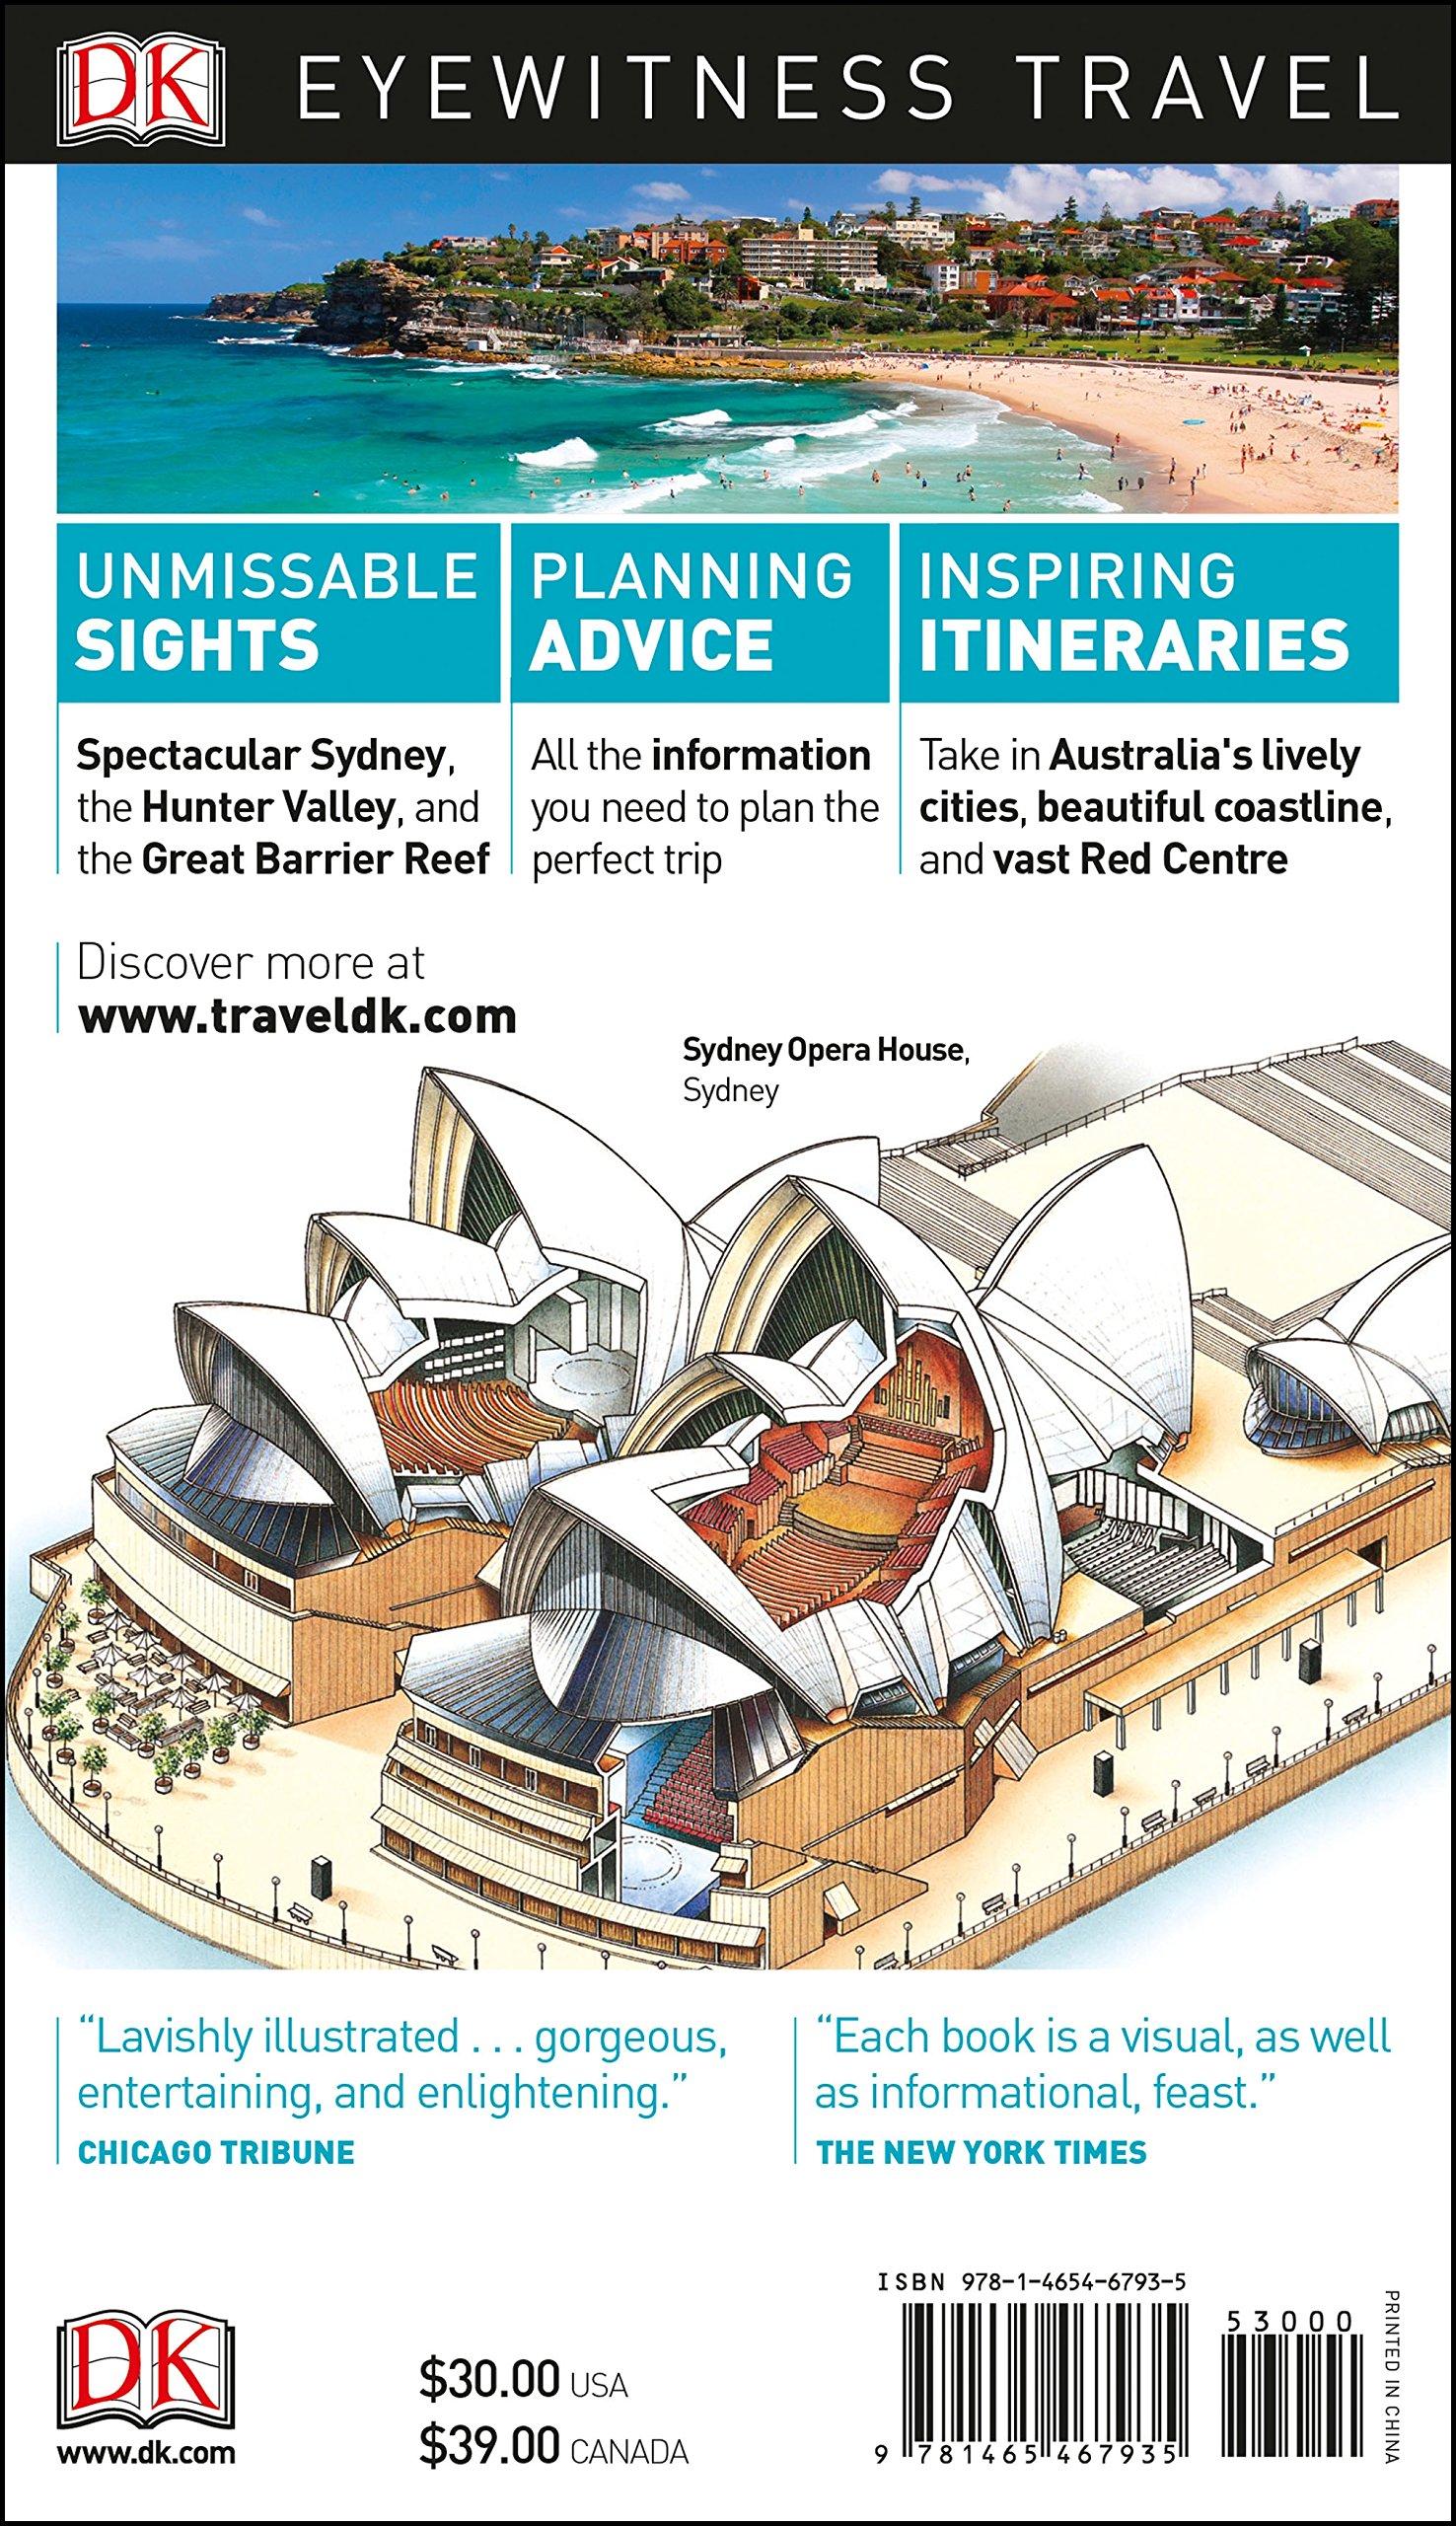 DK Eyewitness Travel Guide Australia - 91NC0QGBLUL - Getting Down Under